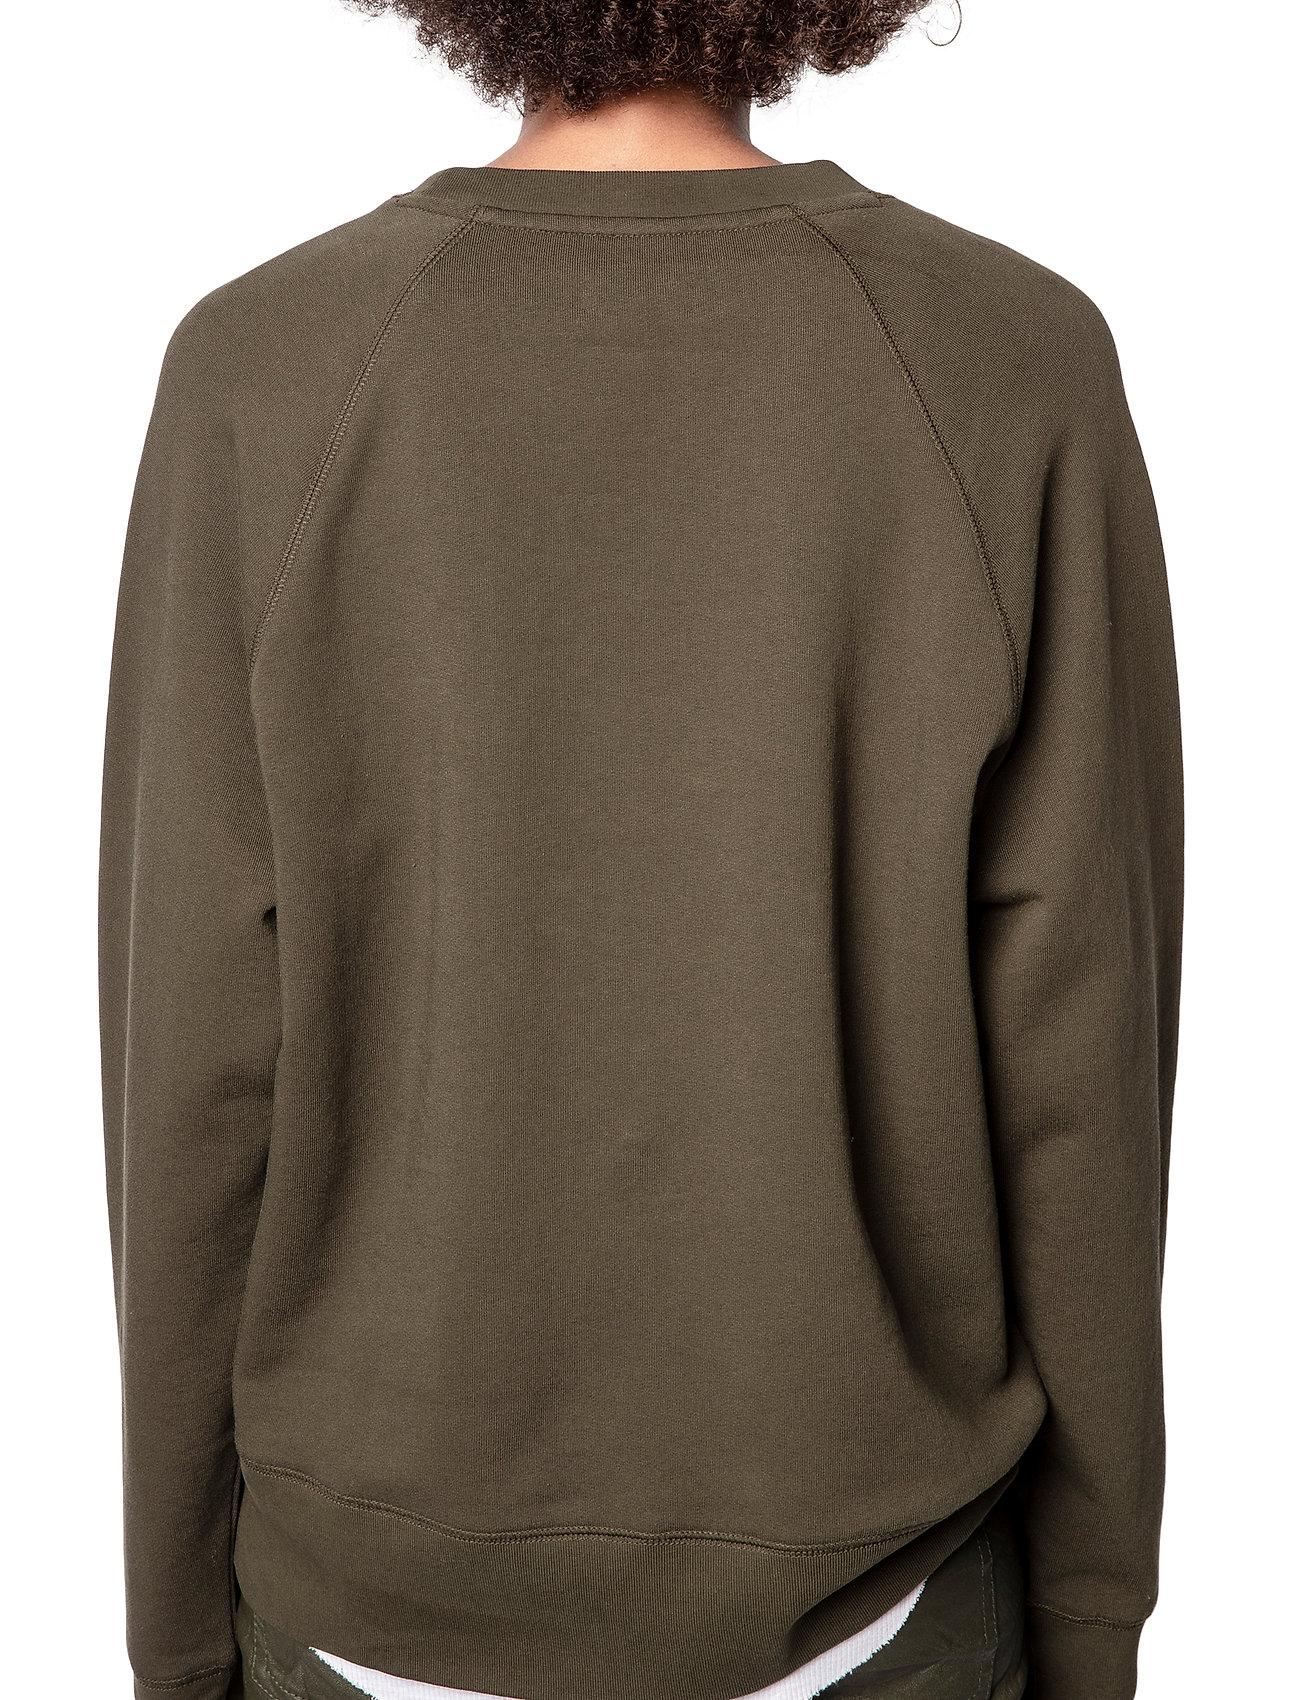 Zadig & Voltaire - UPPER BLASON BRODE TONAL EMBROIDERED COTTON SWEATS - sweatshirts & hættetrøjer - khaki - 4